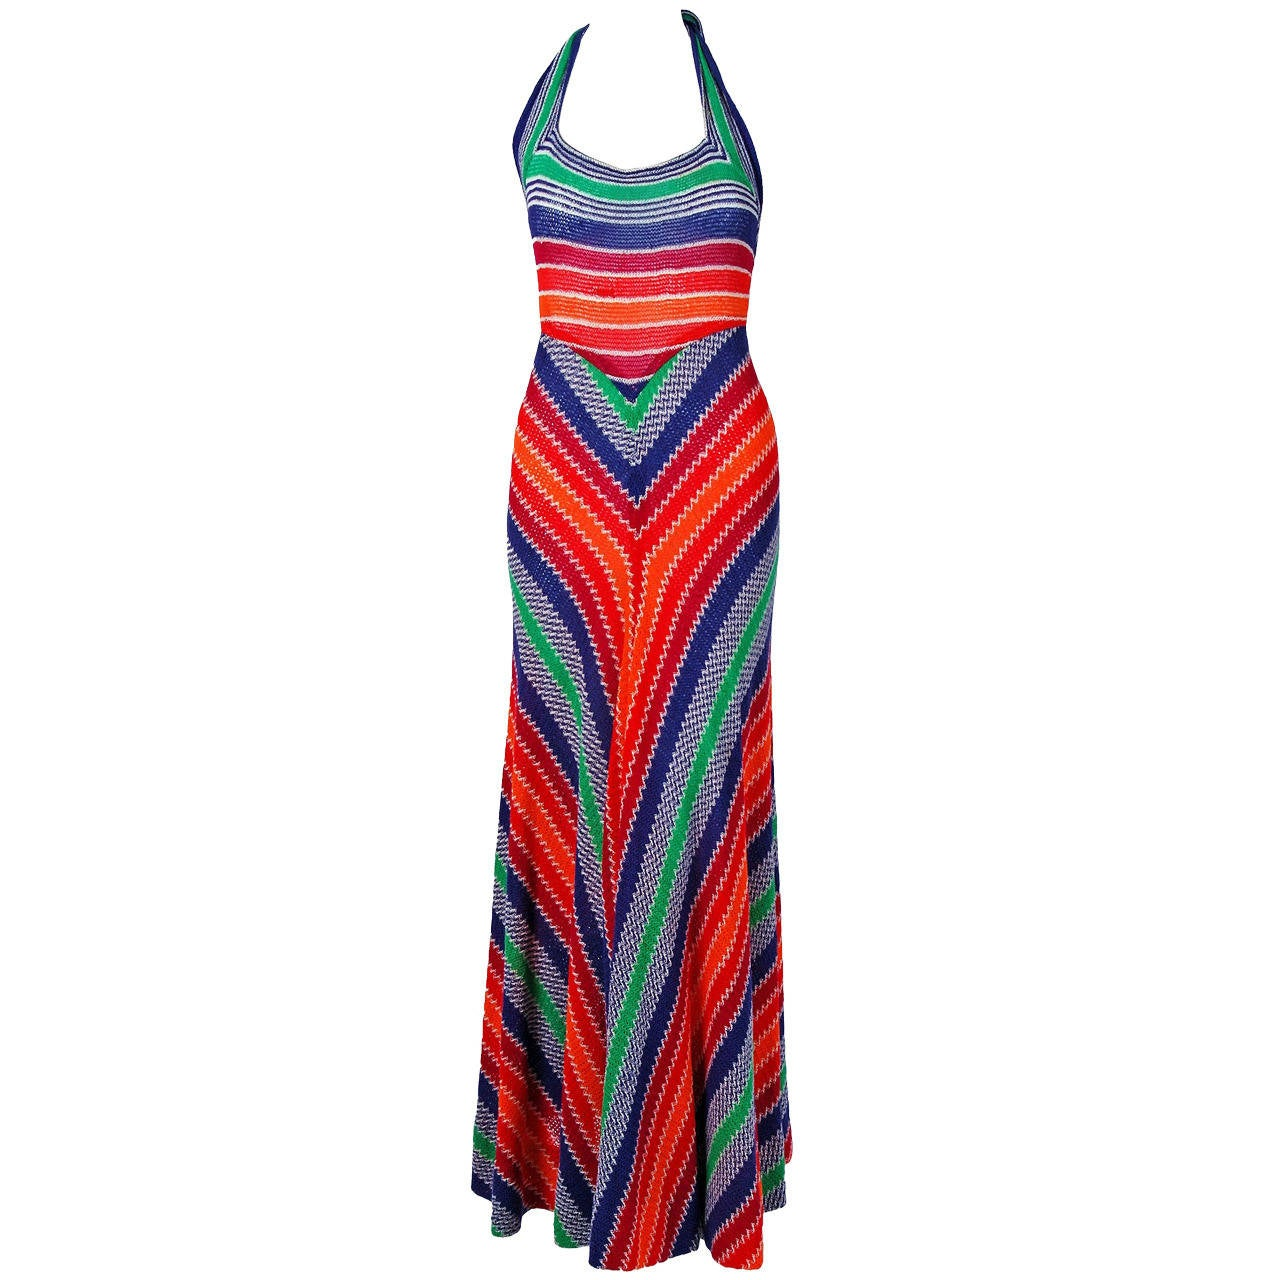 1970's Missoni Vibrant Rainbow Stripe Graphic Knit Bias-Cut Halter Maxi Dress 1